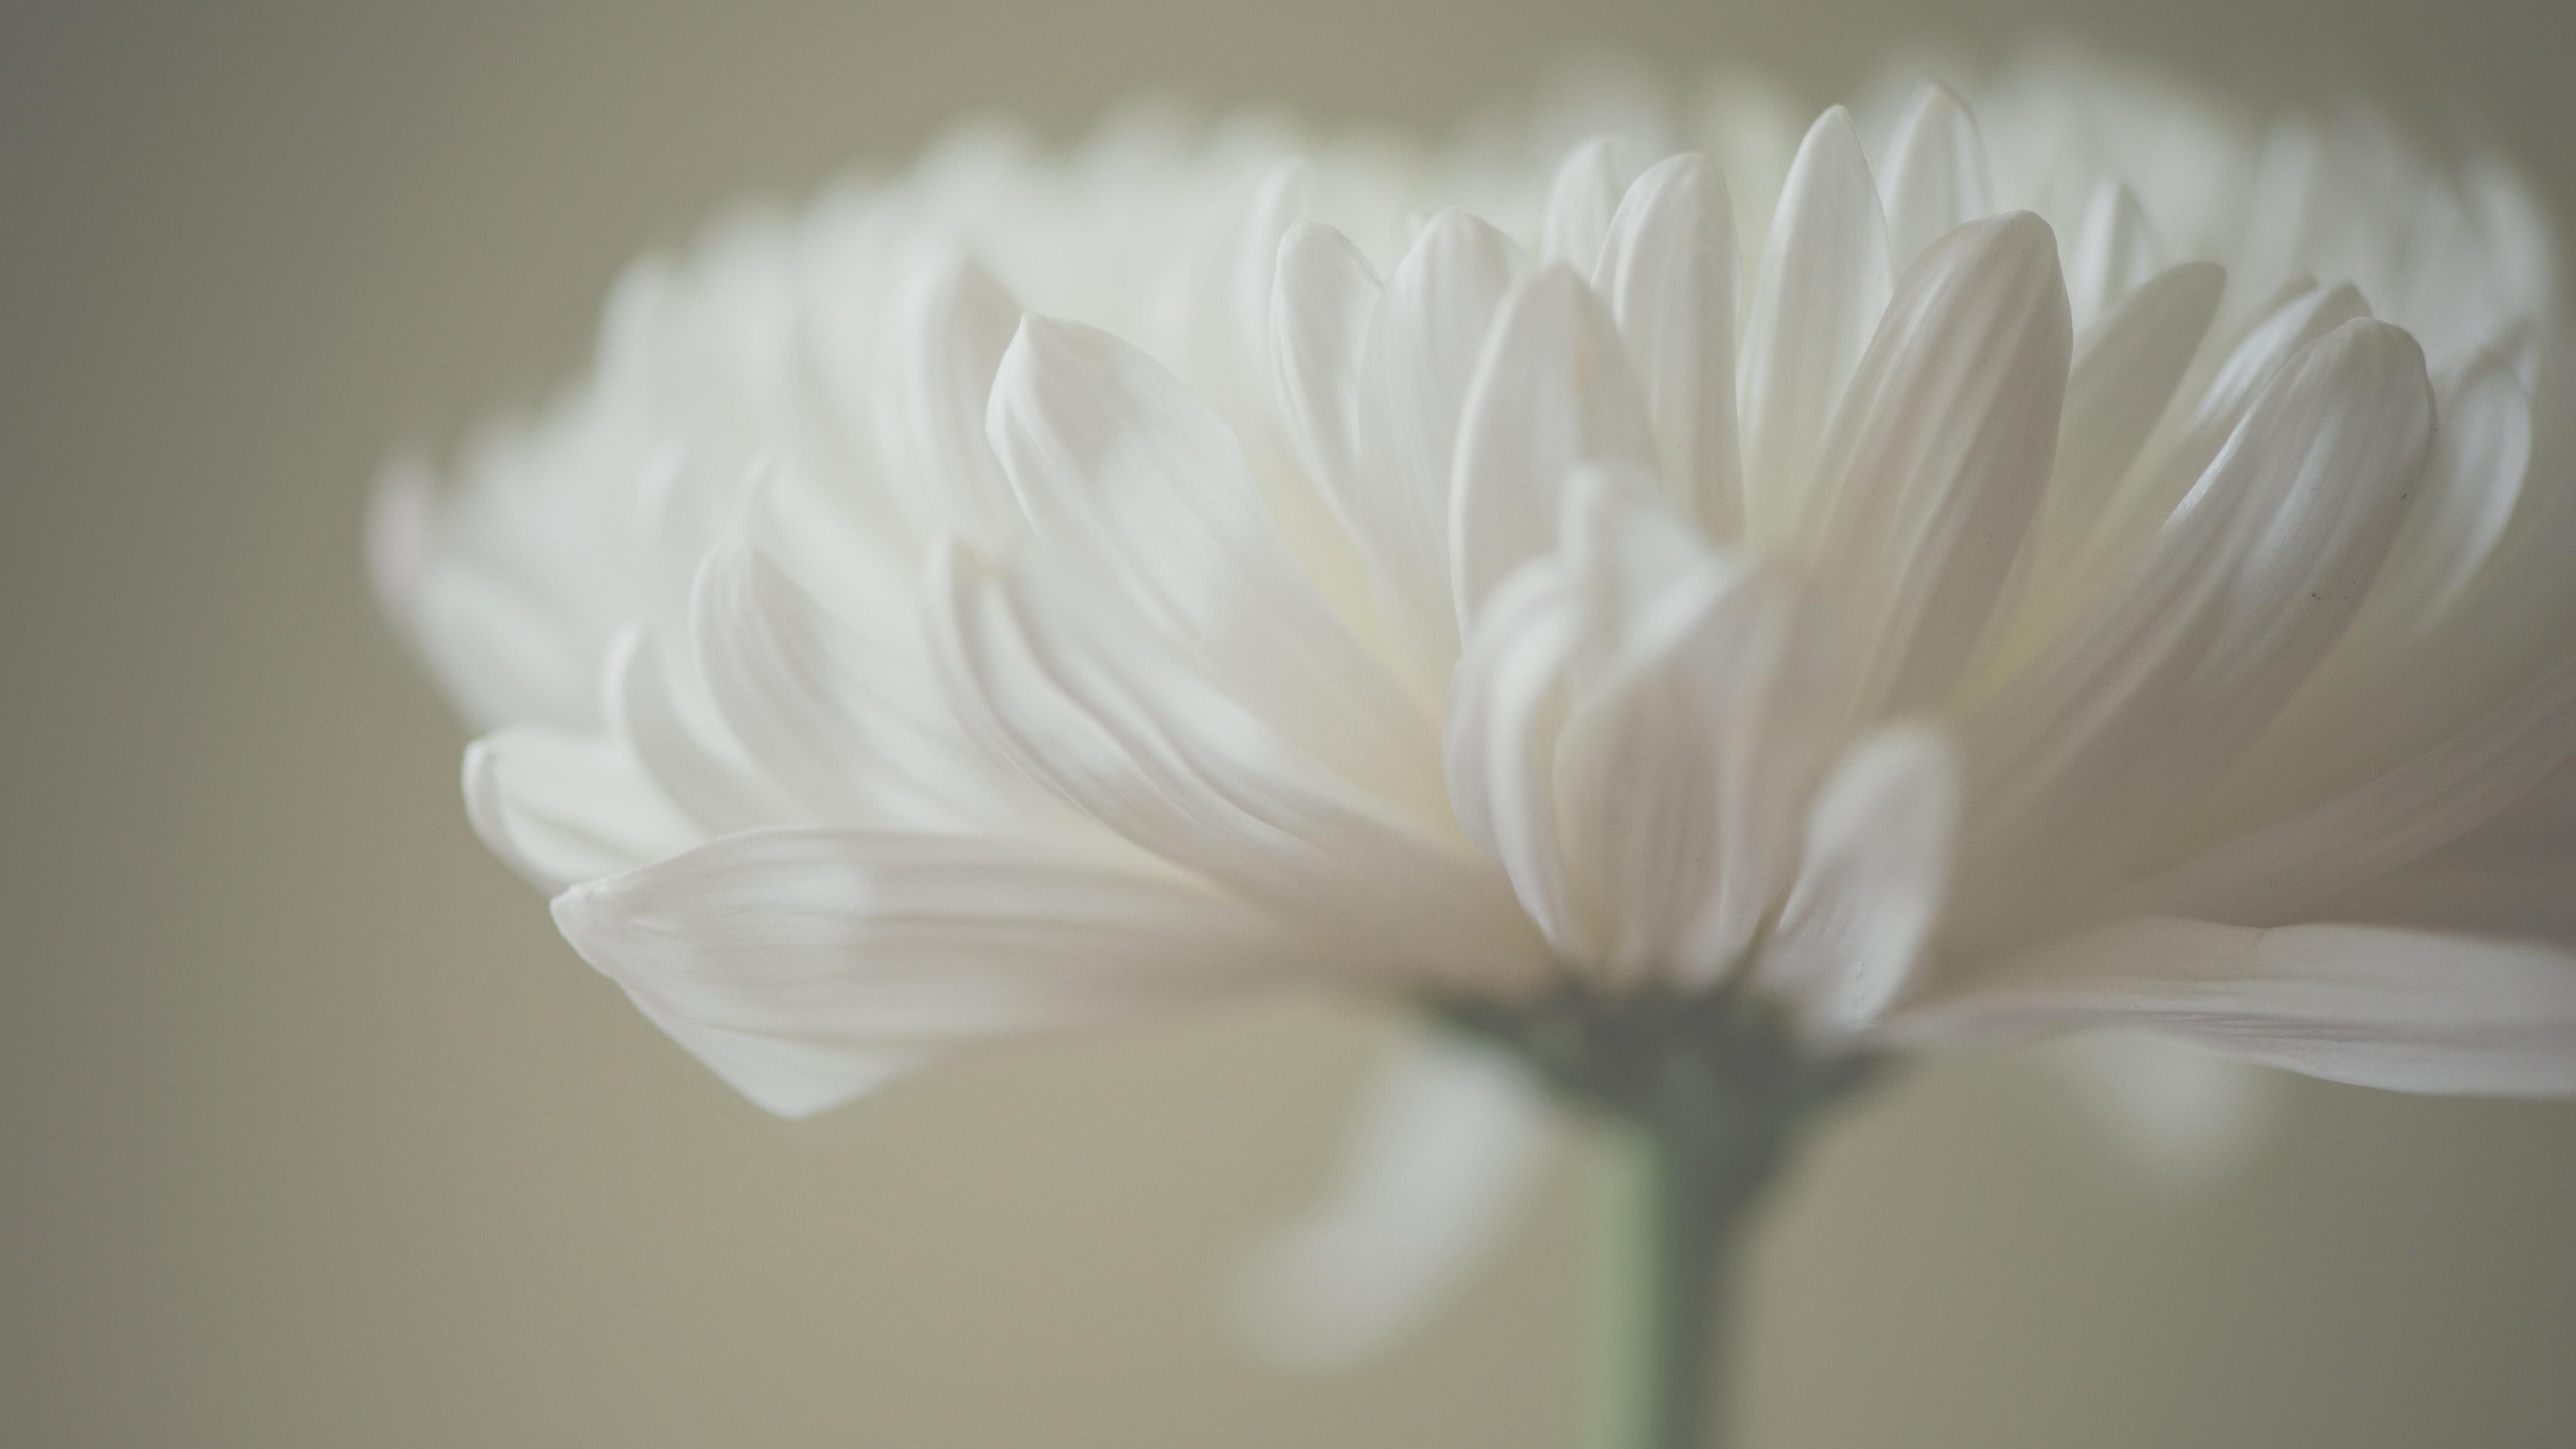 Live Wallpaper For Iphone X Wallpaper Aster 5k 4k Wallpaper Macro Petals White